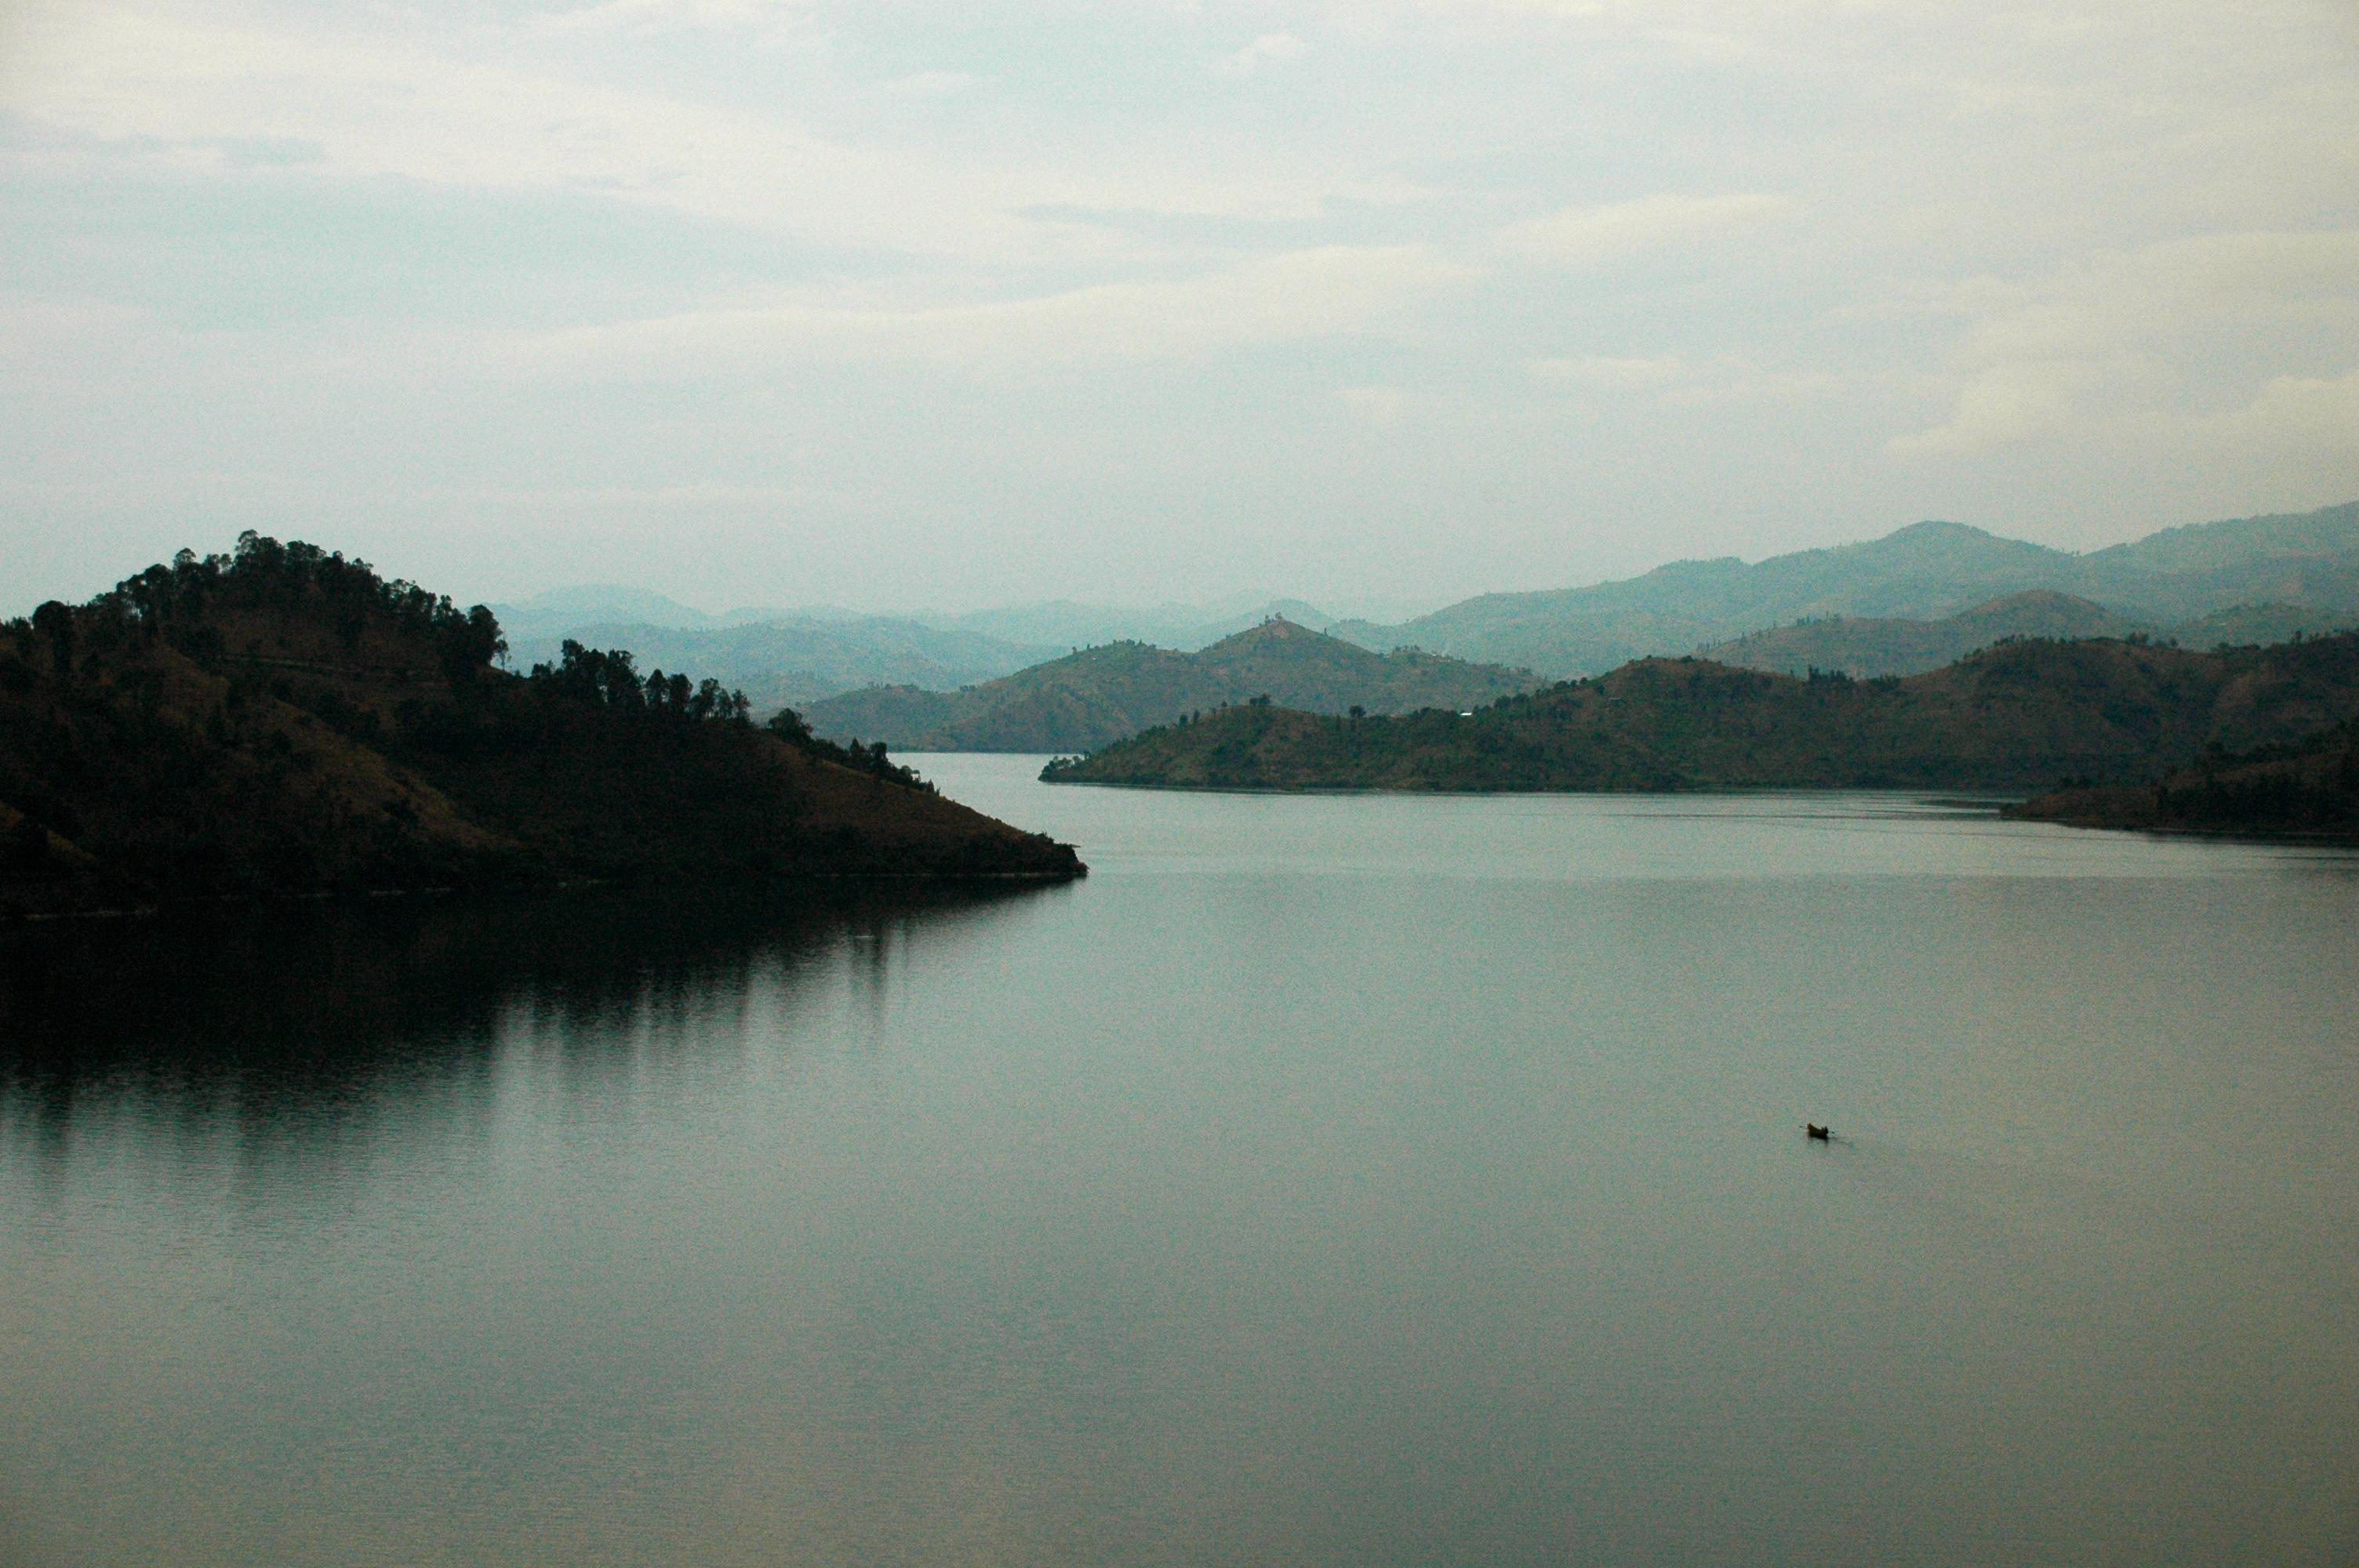 rwanda nziza a photo essay a year in kigali rwanda lake kivu